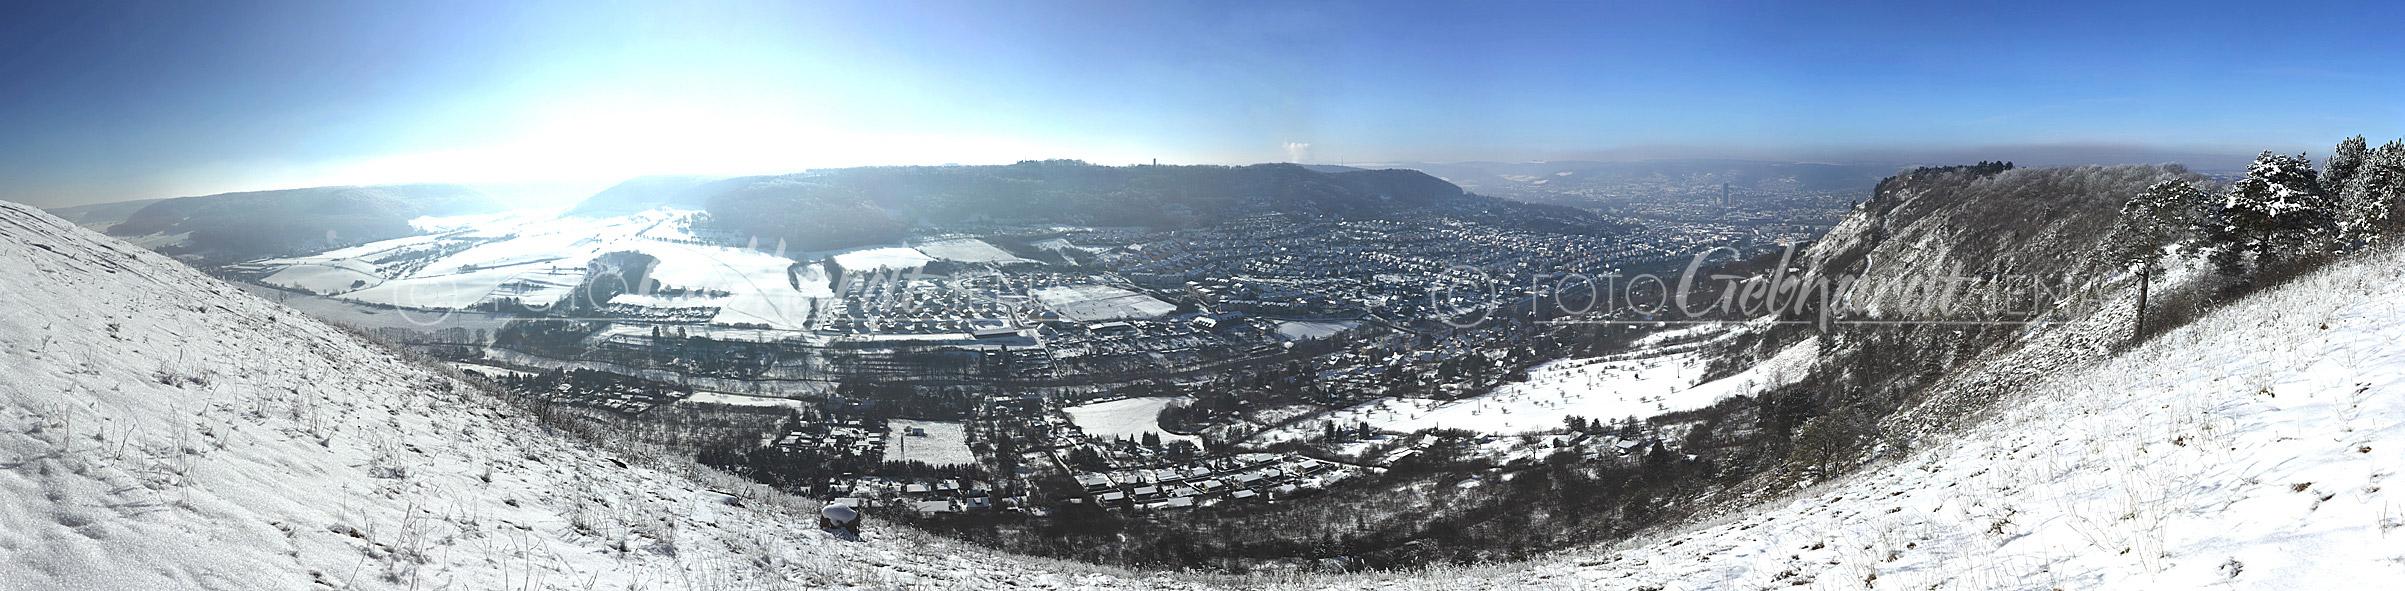 Blick vom Jenzig nach Jena - Ost